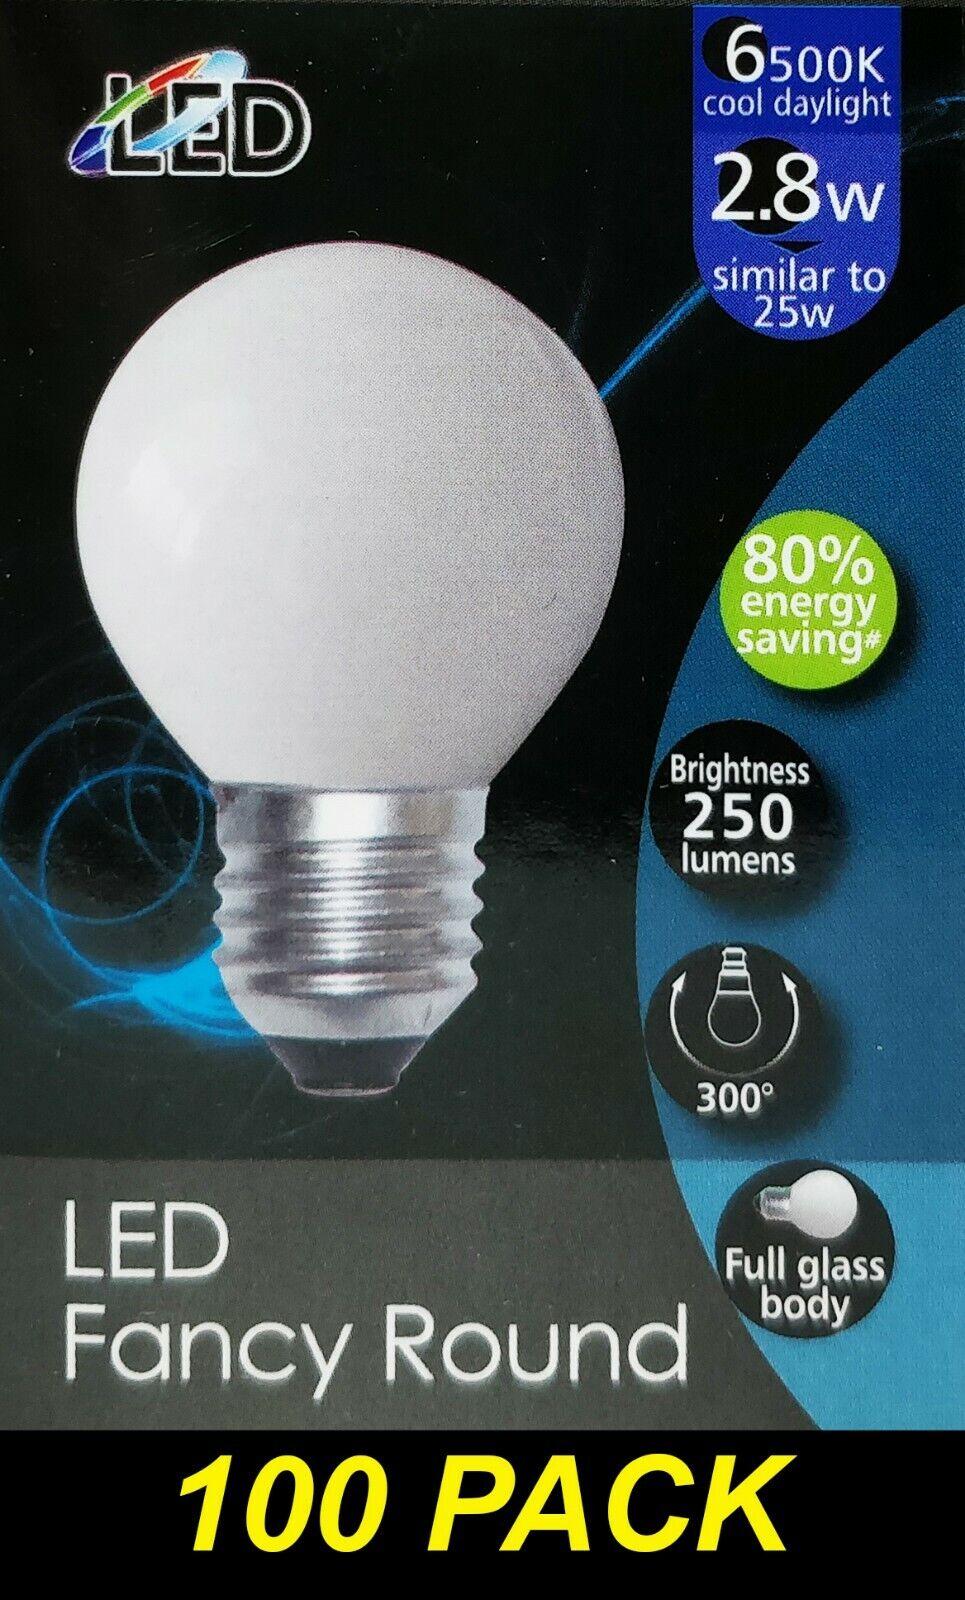 BULK 100 x 3W LED Cool Daylight Globes Bulbs Lamps E27 Screw